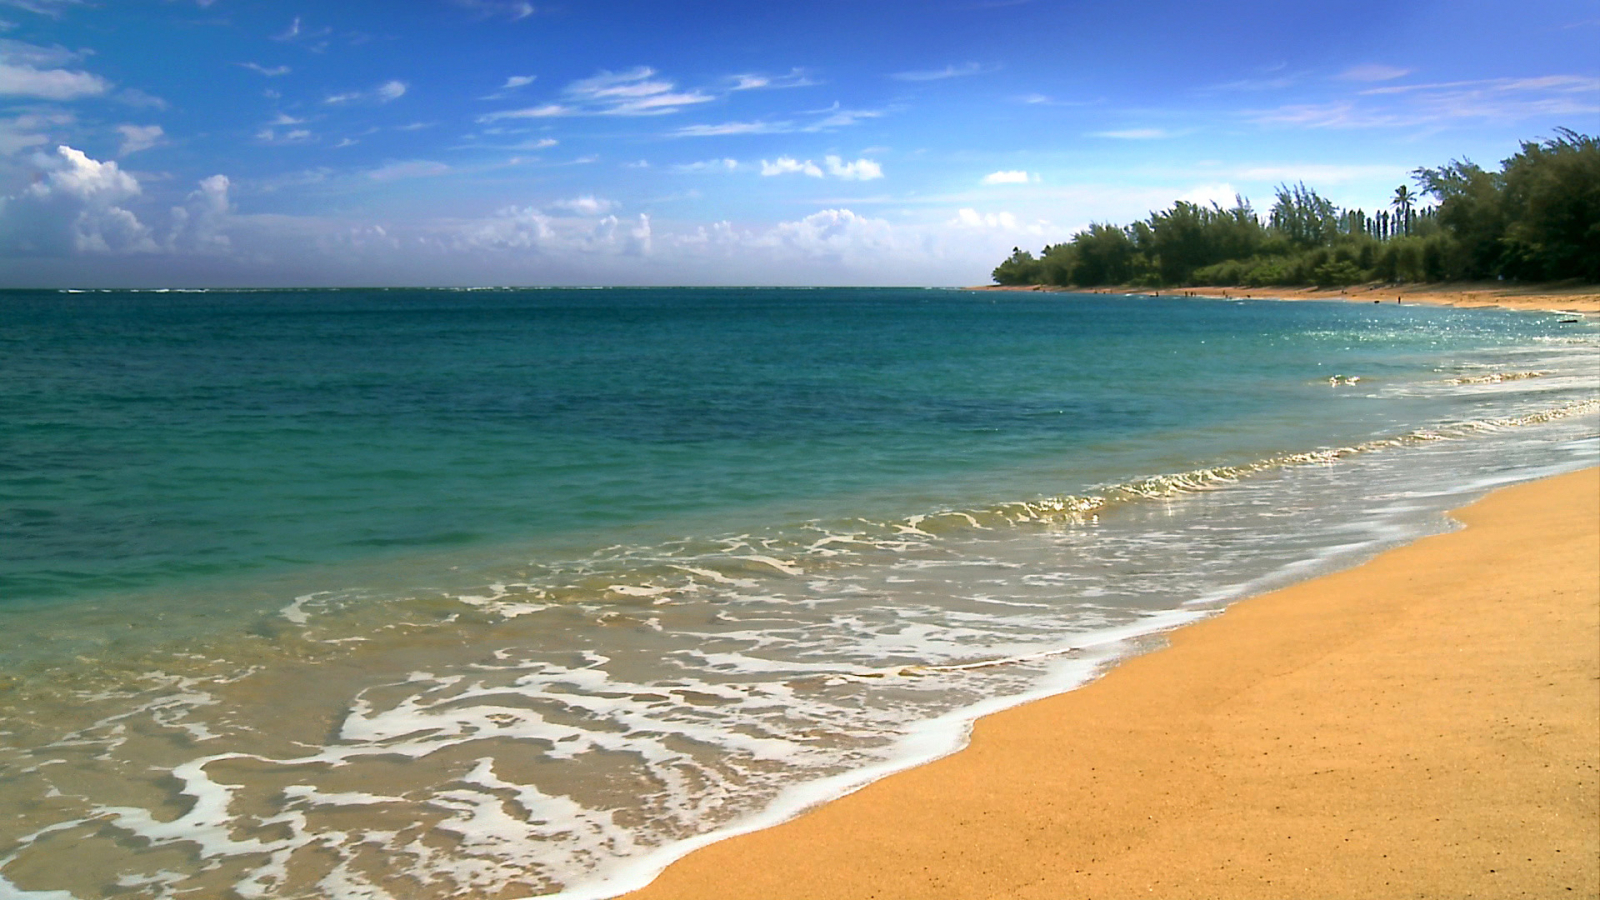 1920x1080px free wallpaper hawaii beach scenes - wallpapersafari